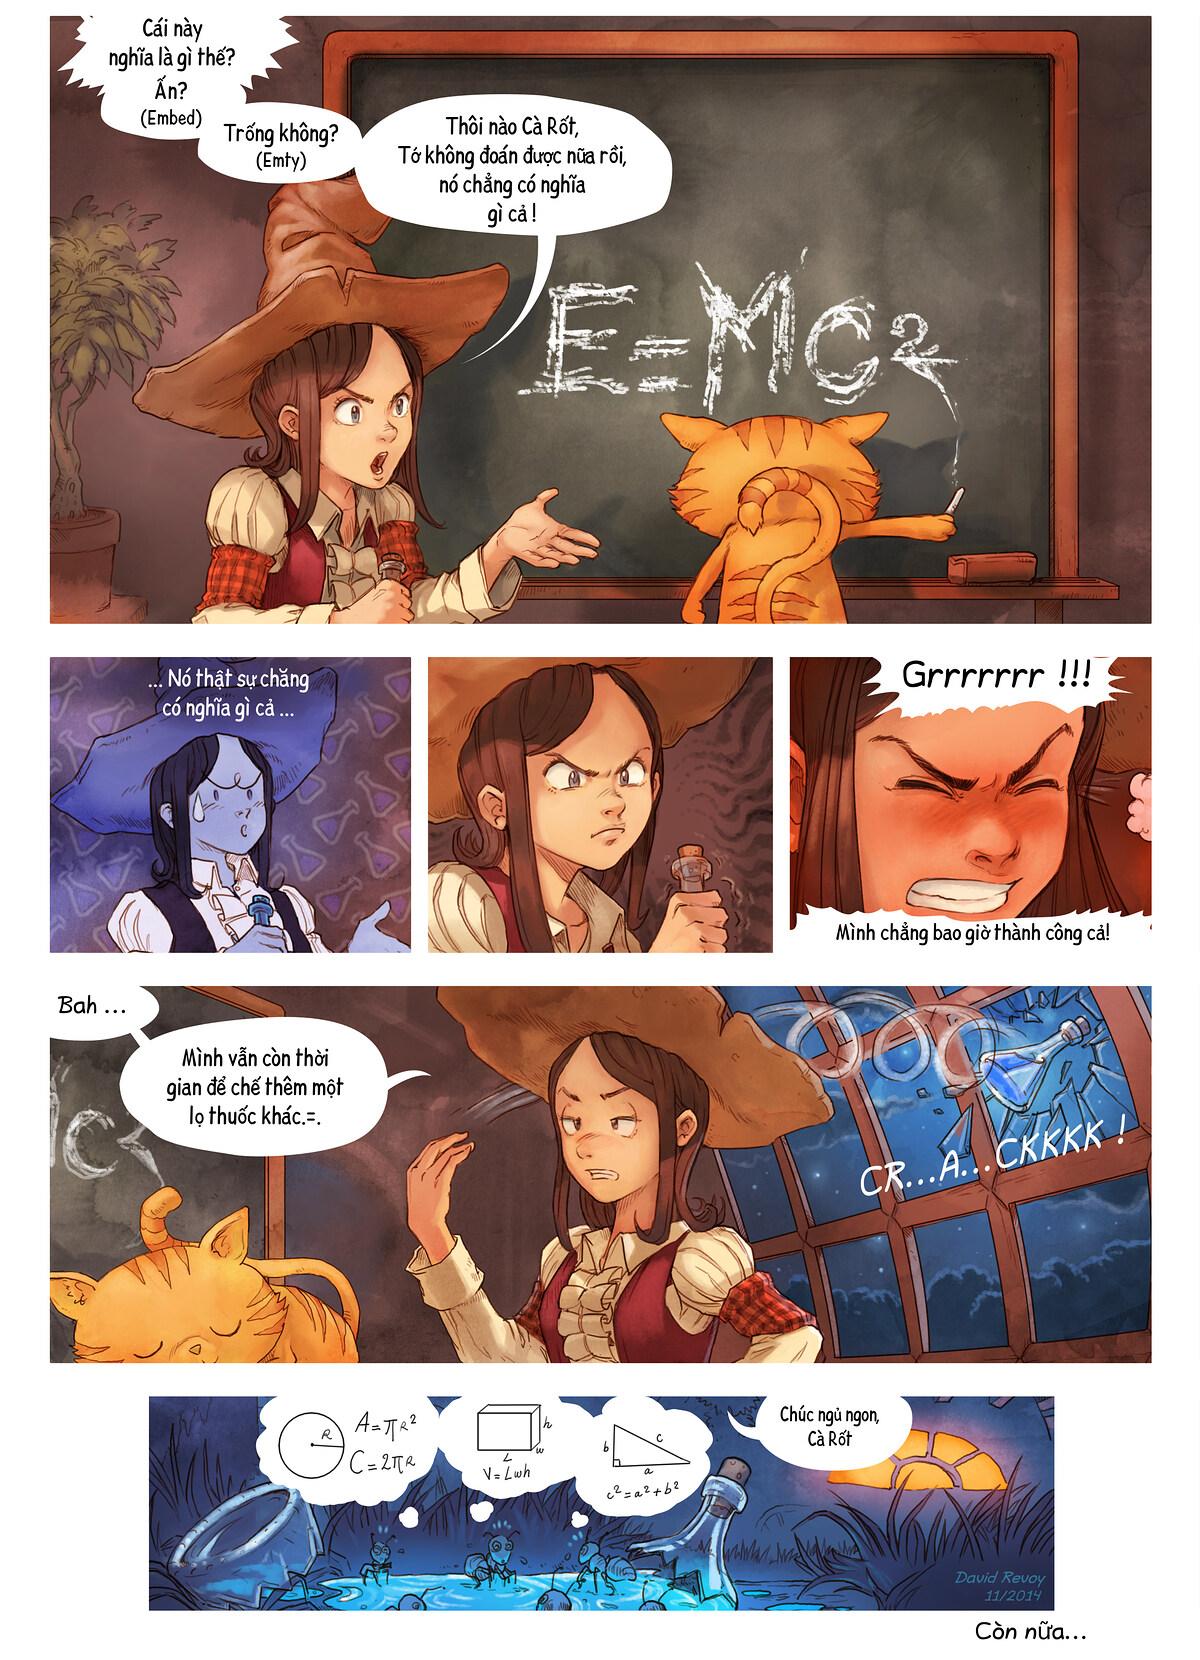 A webcomic page of Pepper&Carrot, Tập 4 [vi], trang 7